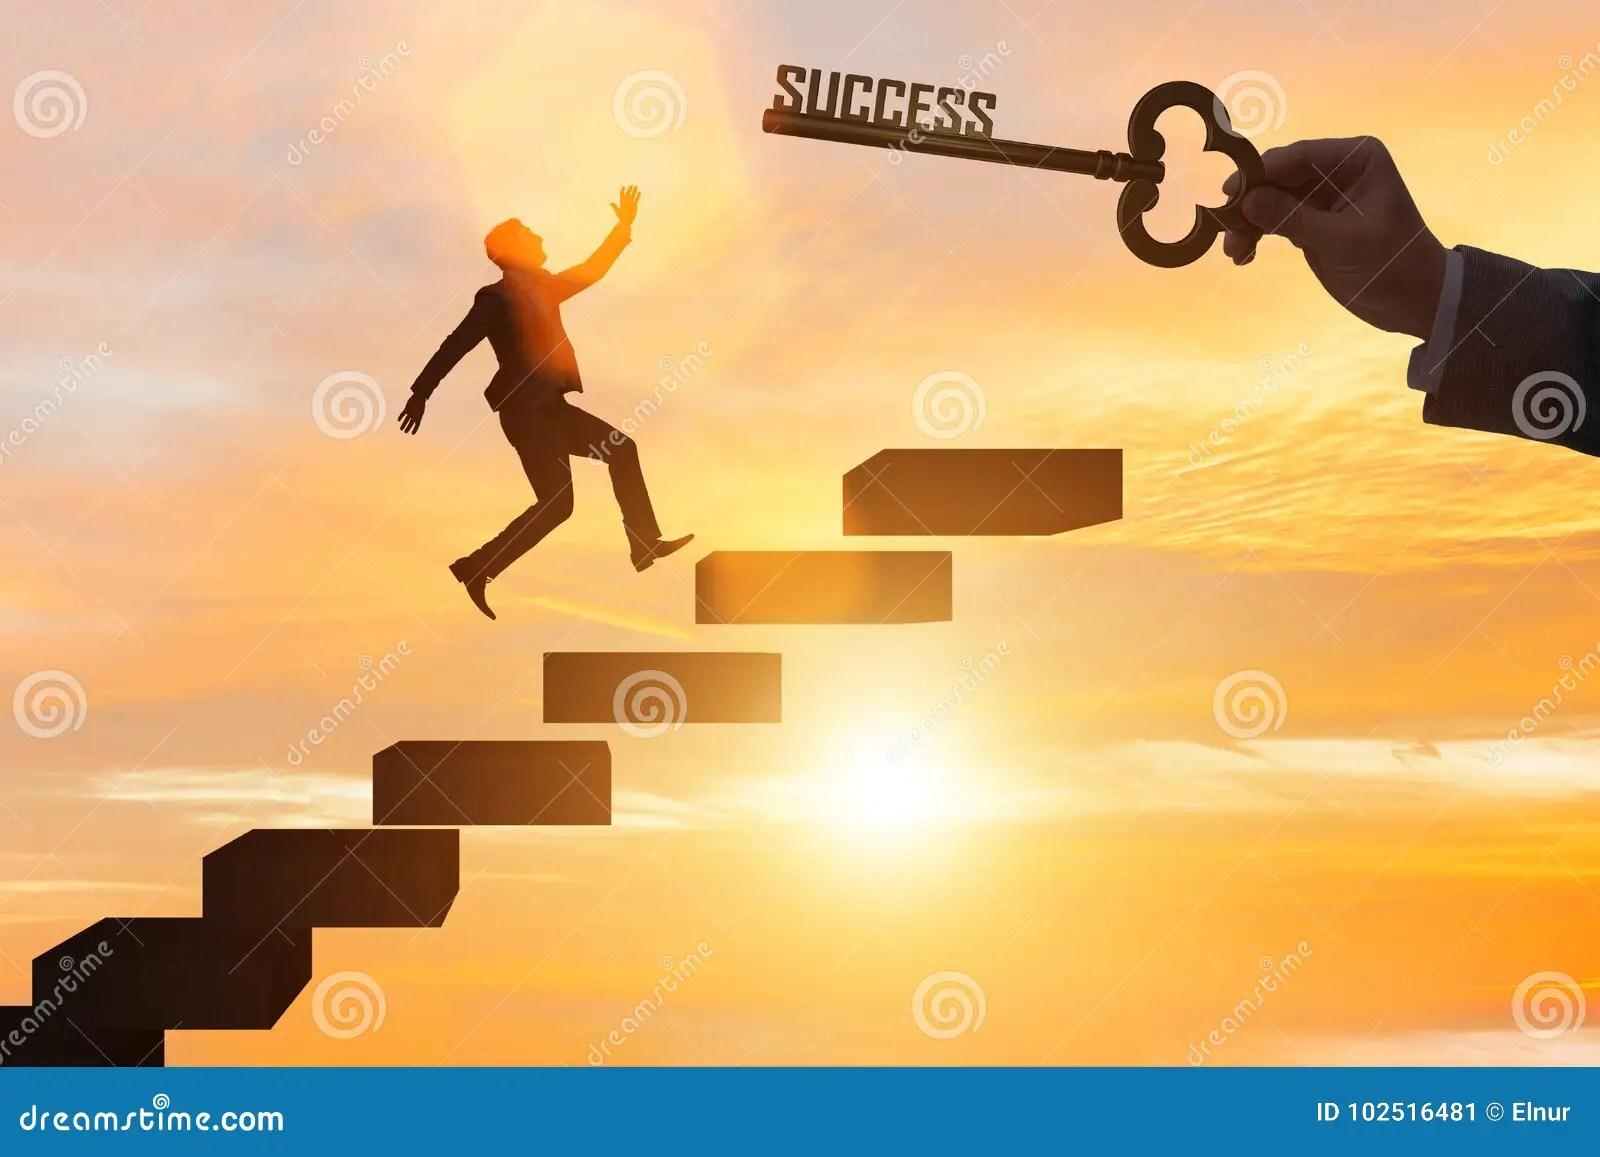 The Businessman Climbing The Career Ladder Of Success